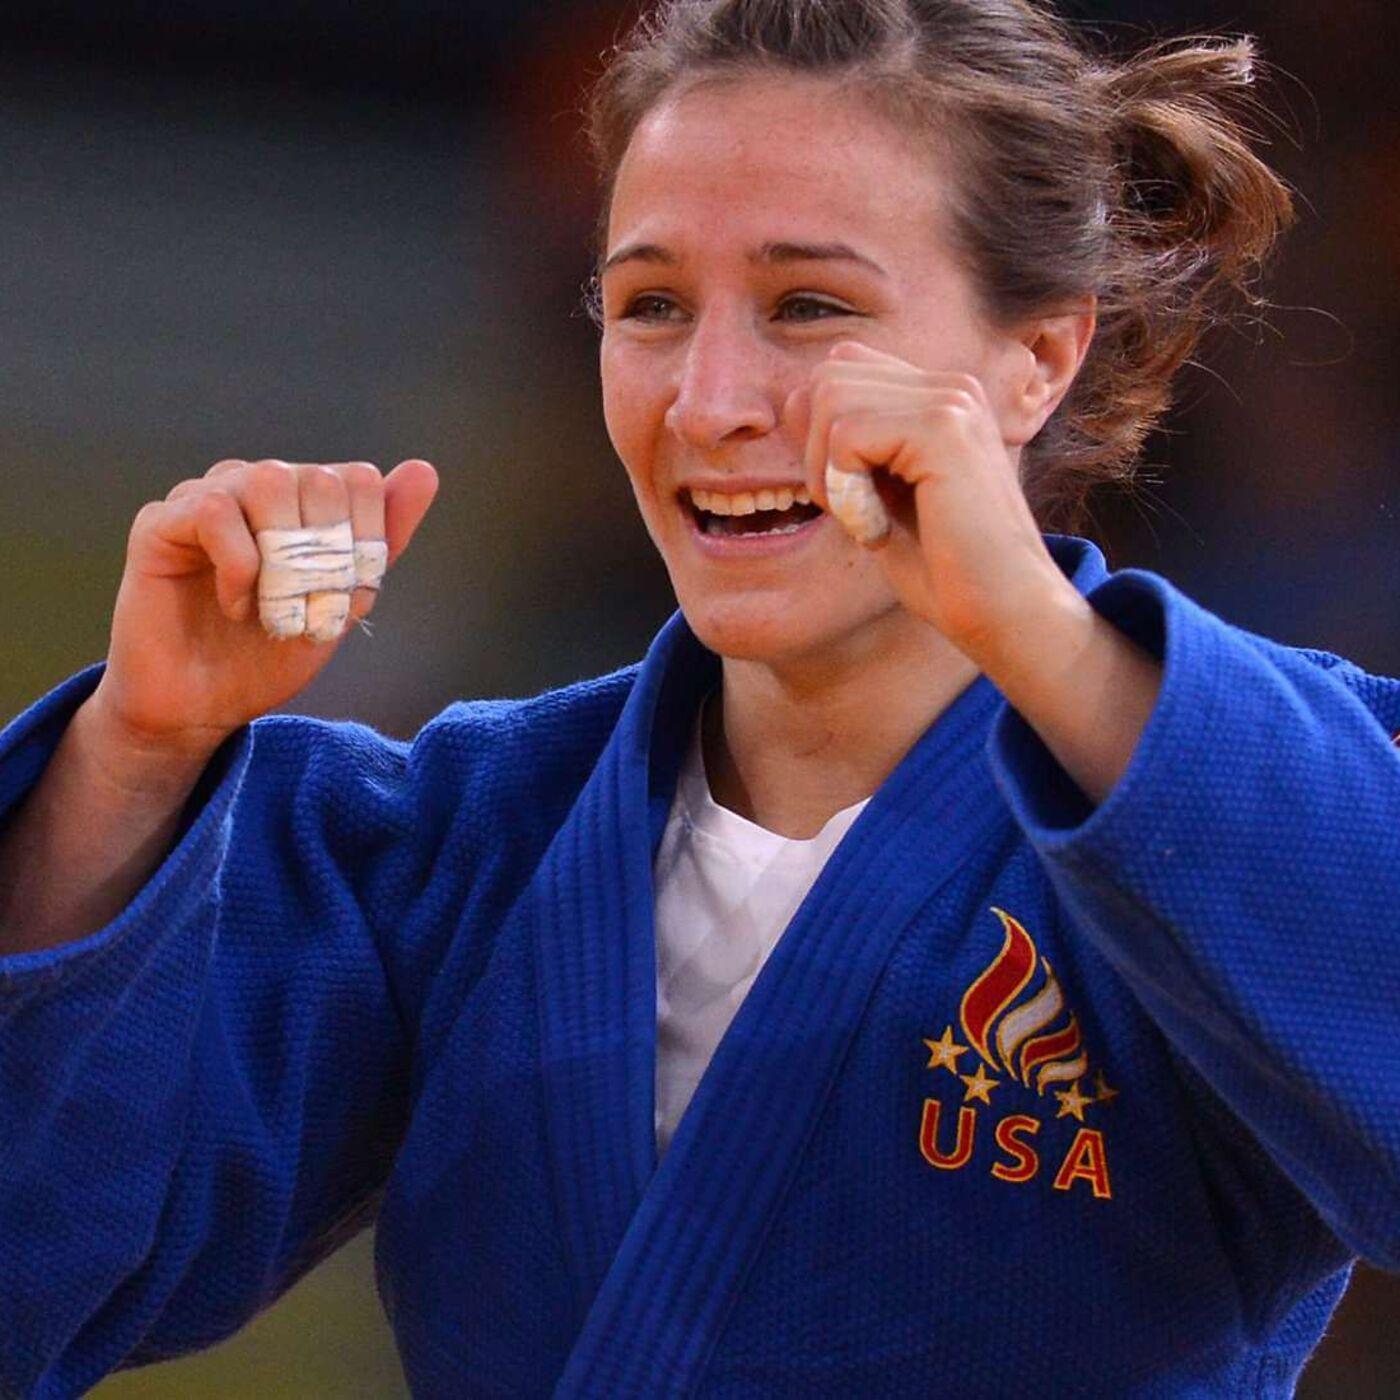 Marti Malloy  (Part 2)-  Olympic Bronze Medalist, World Silver Medalist